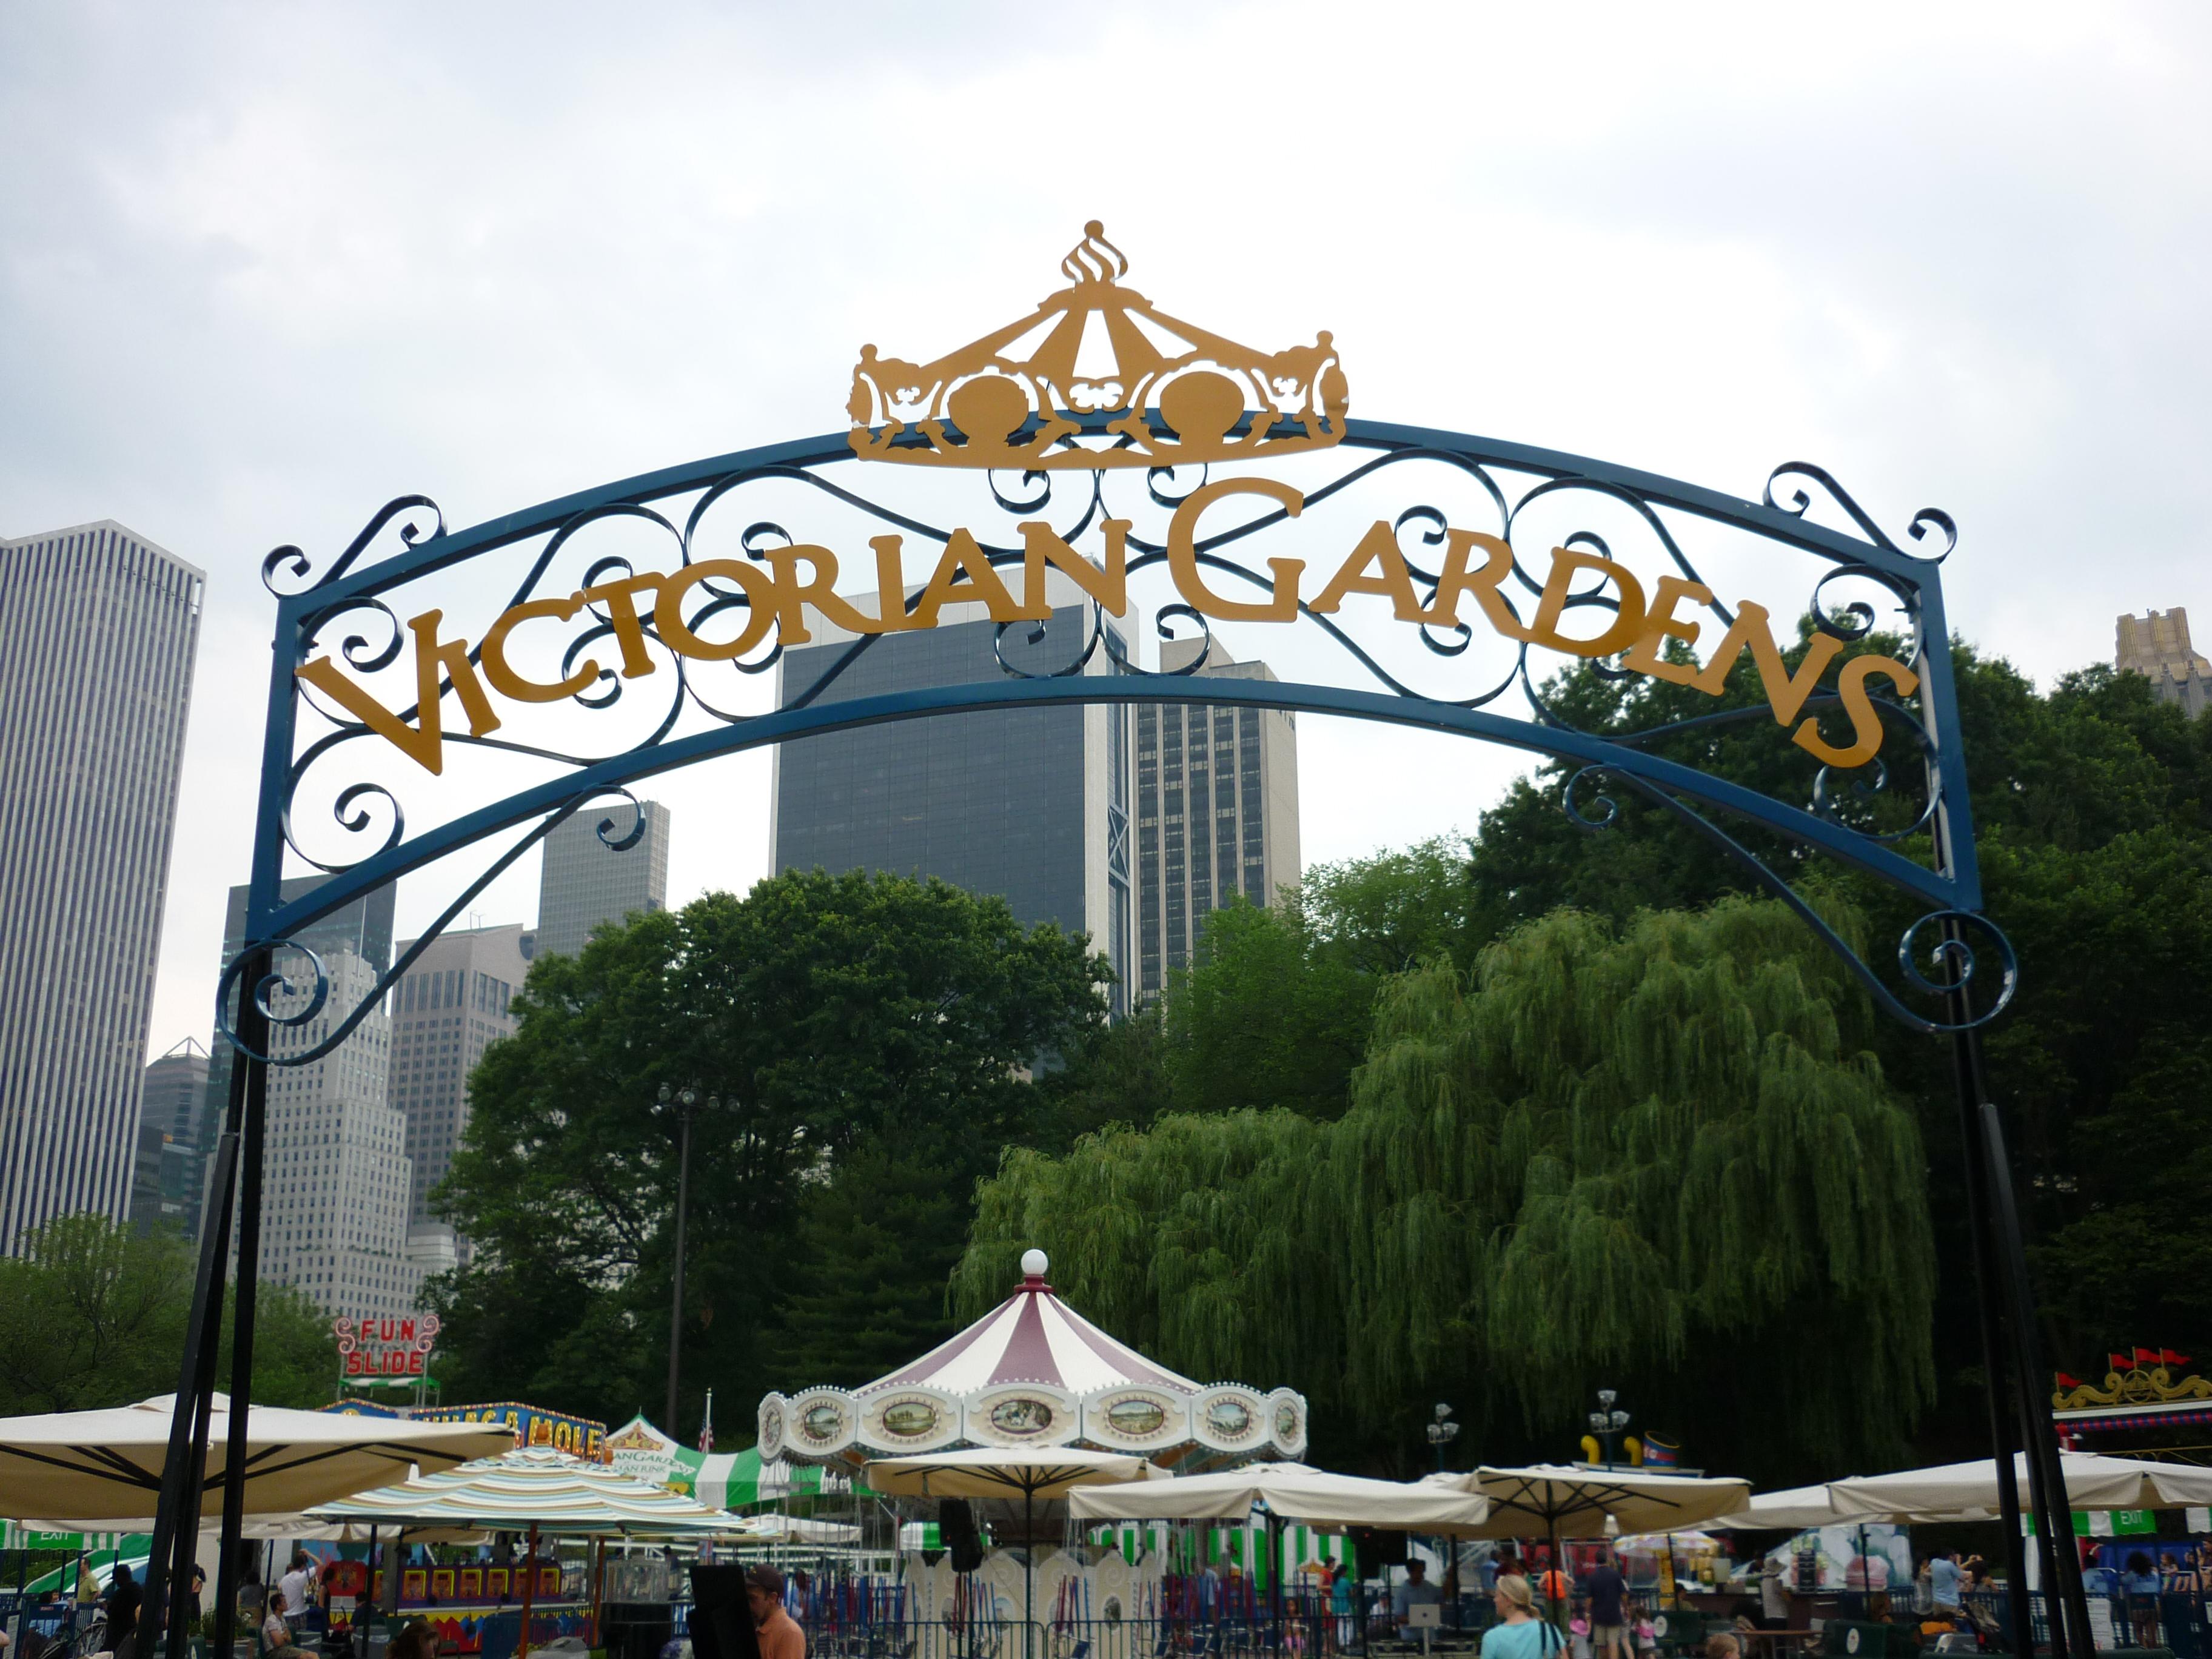 The Victorian Gardens